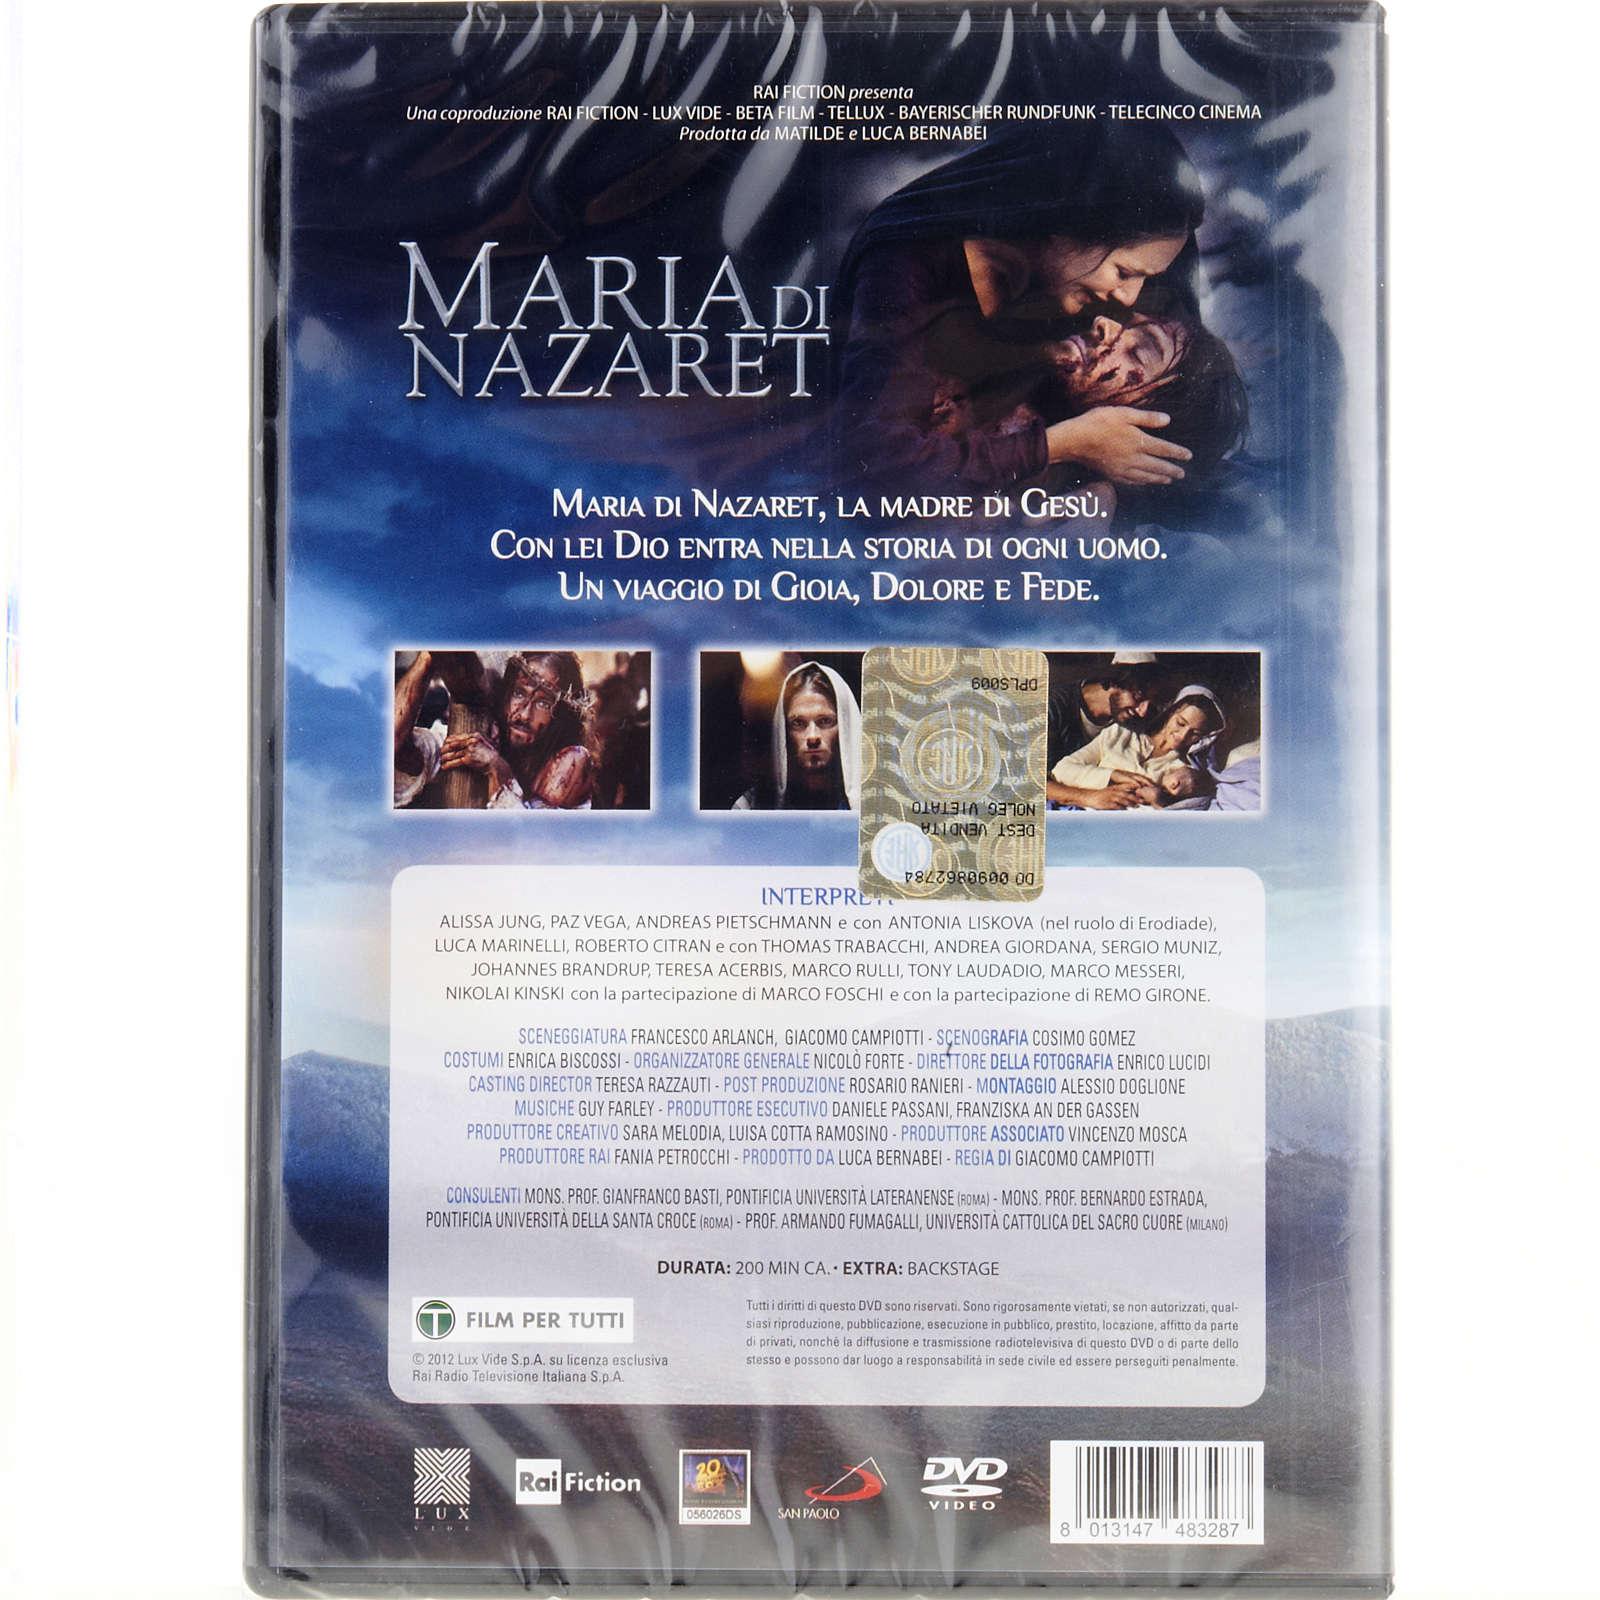 Maria di Nazareth DVD 3